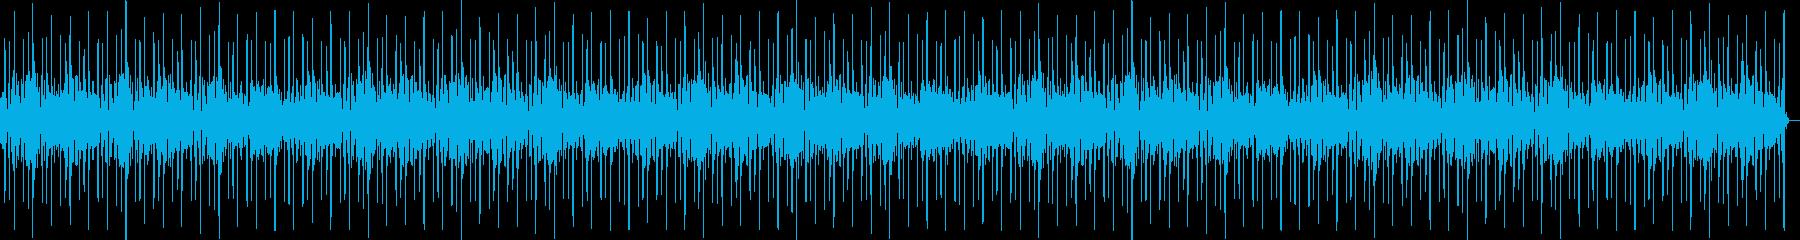 AMGアナログFX20の再生済みの波形